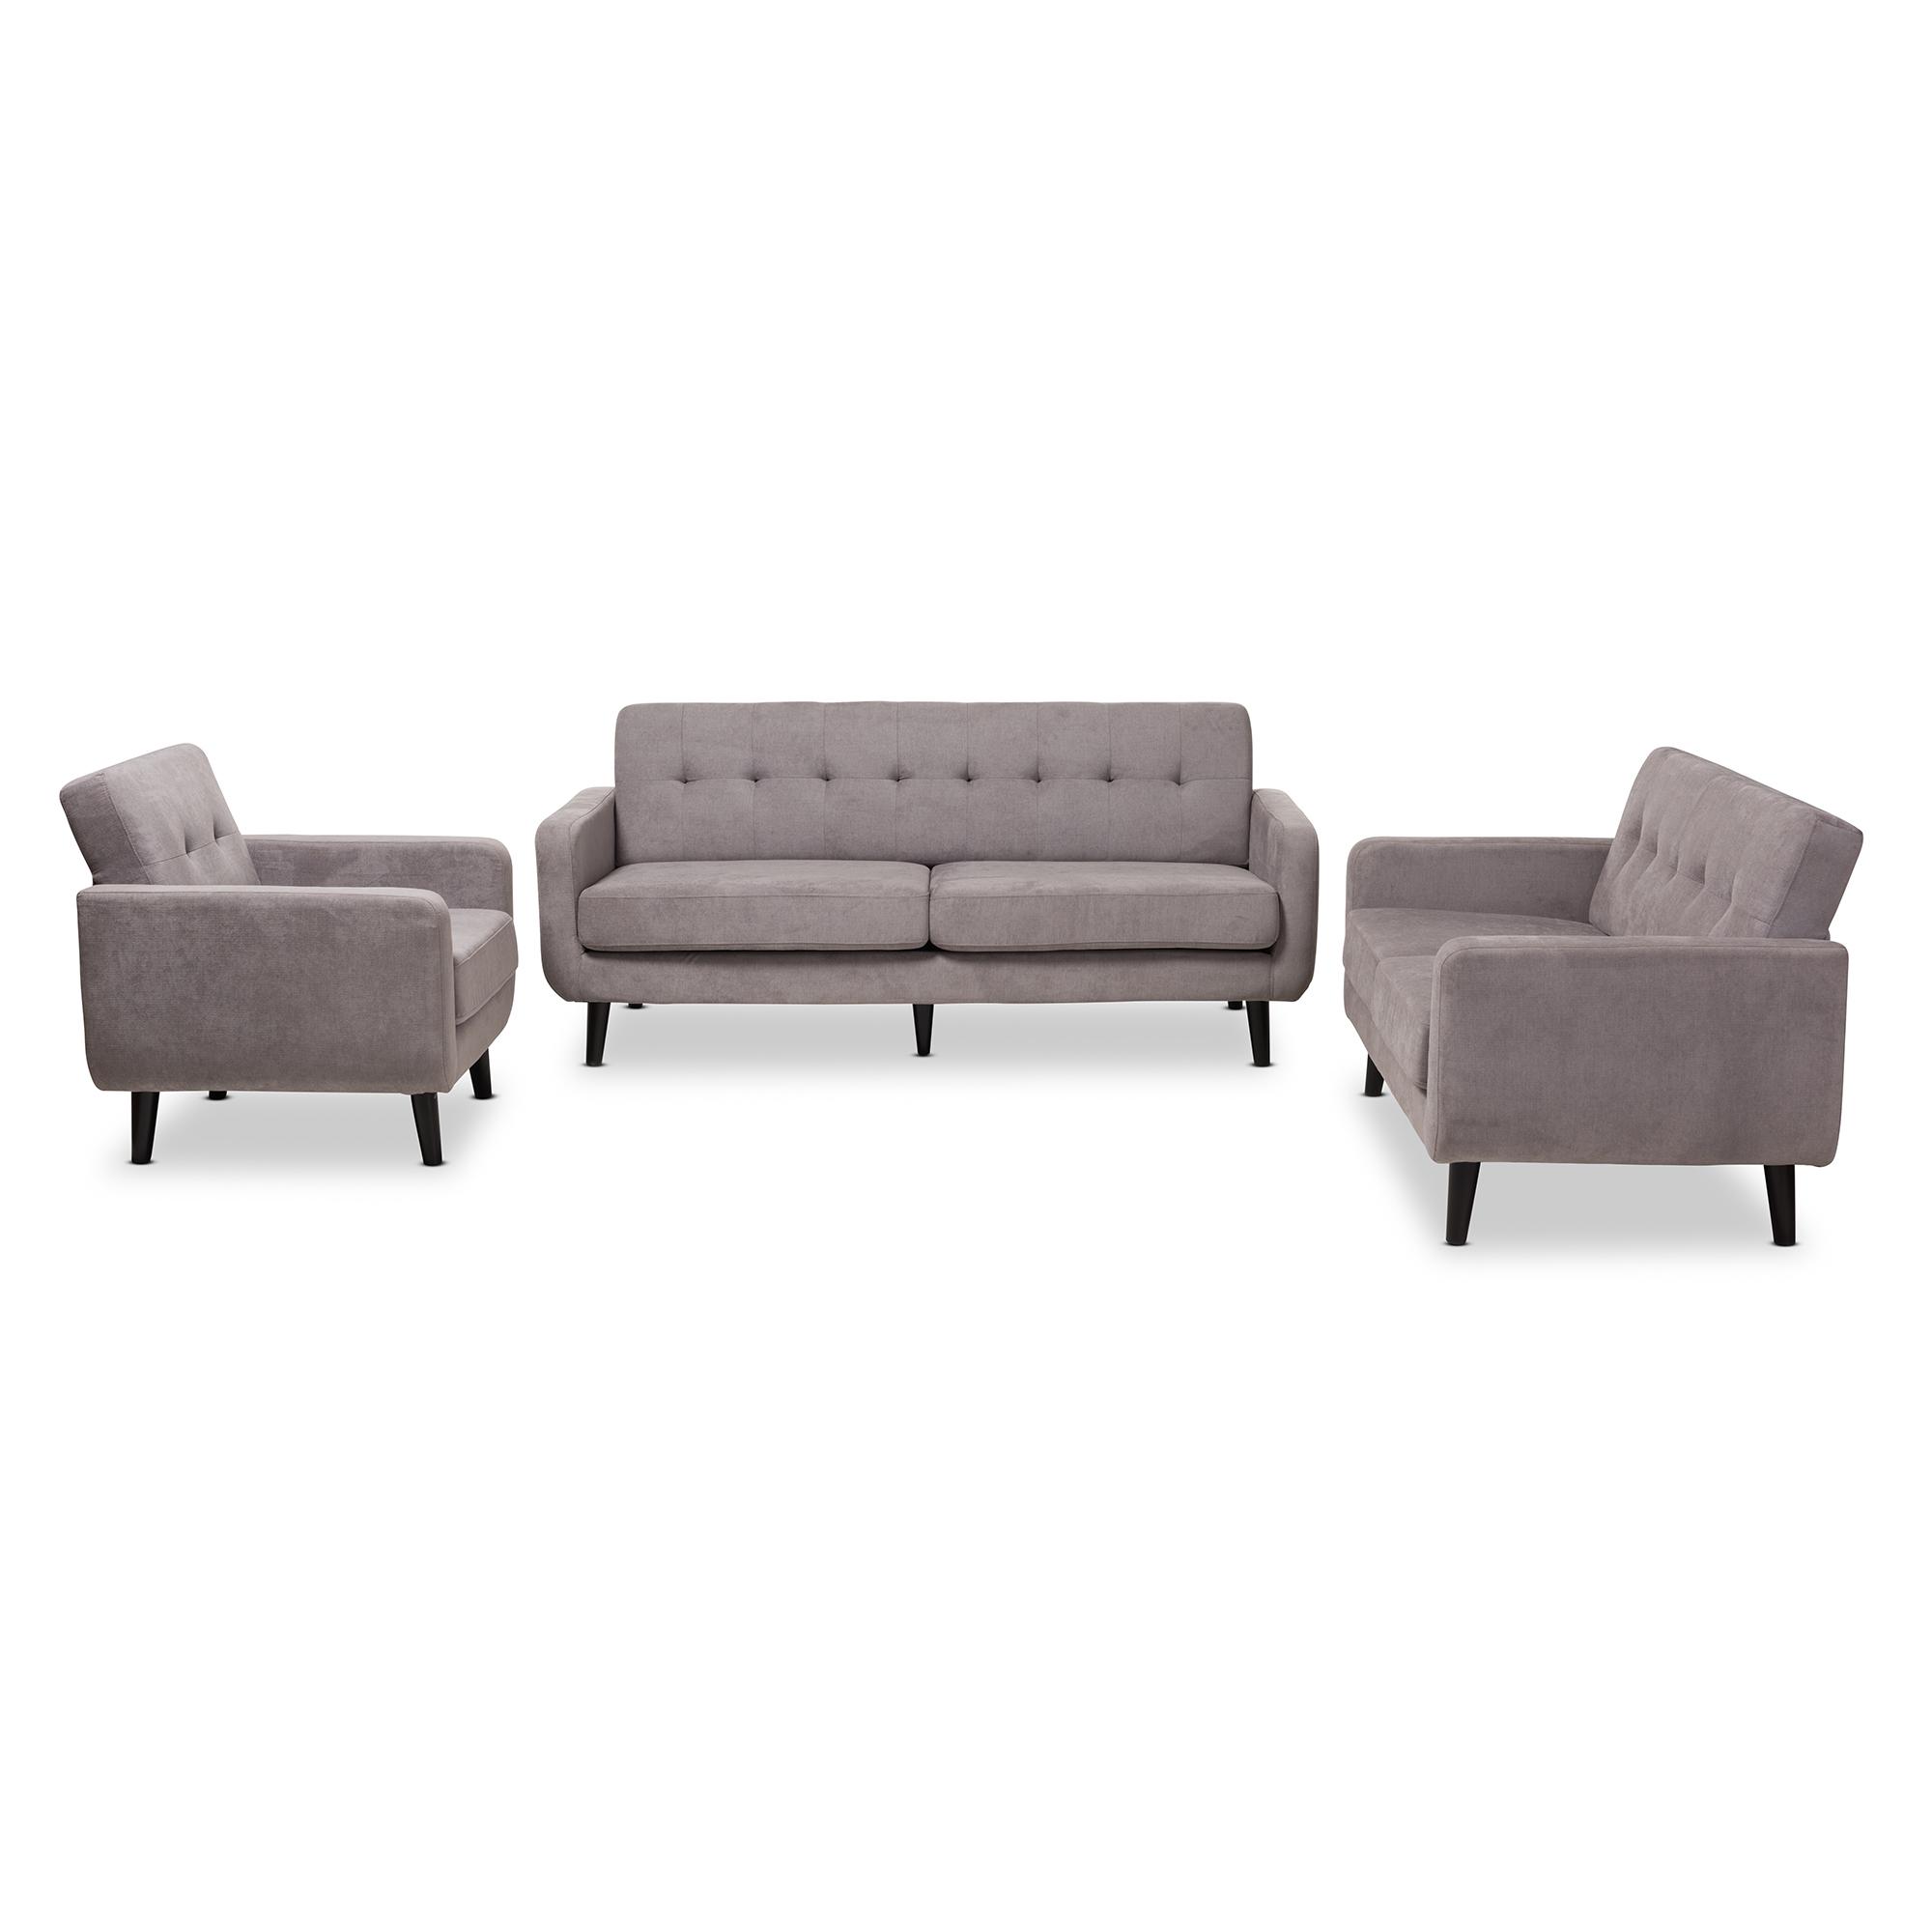 Baxton Studio Carina Mid Century Modern Light Grey Fabric Upholstered  3 Piece Living Room